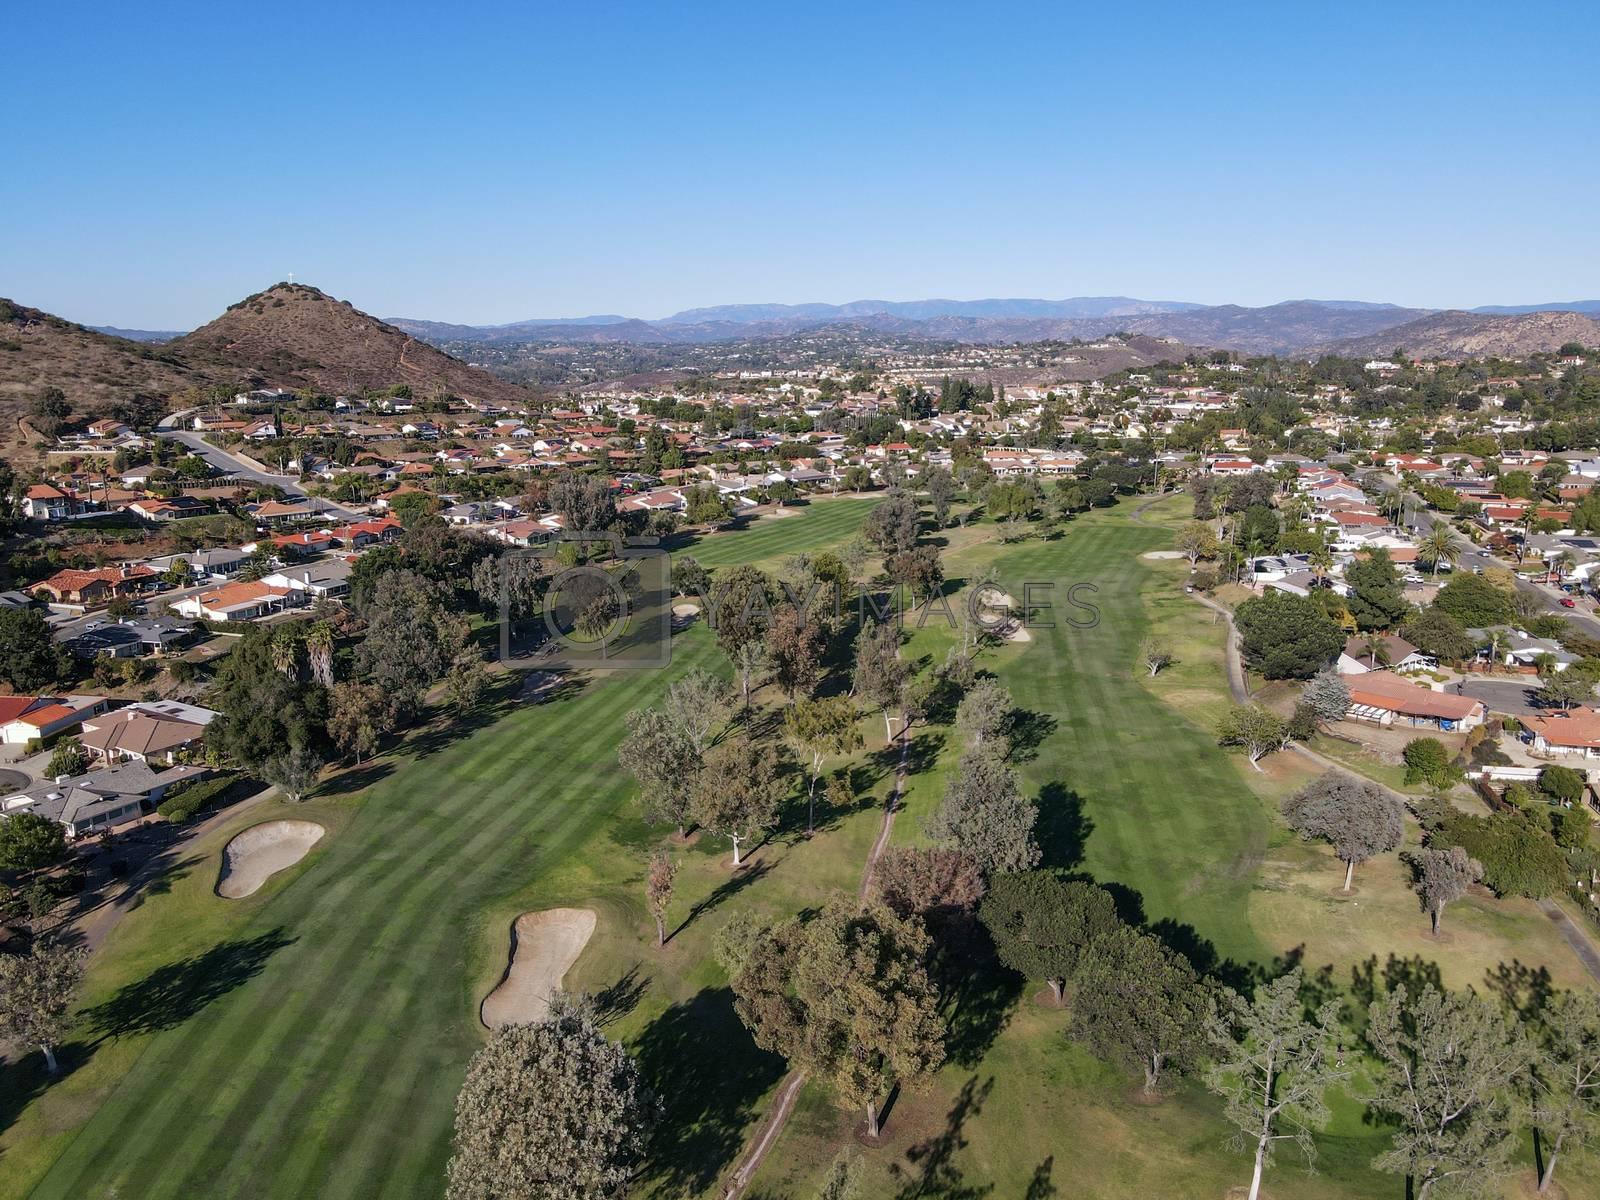 Aerial view of golf in upscale residential neighborhood during autumn season, Rancho Bernardo, San Diego County, California. USA.